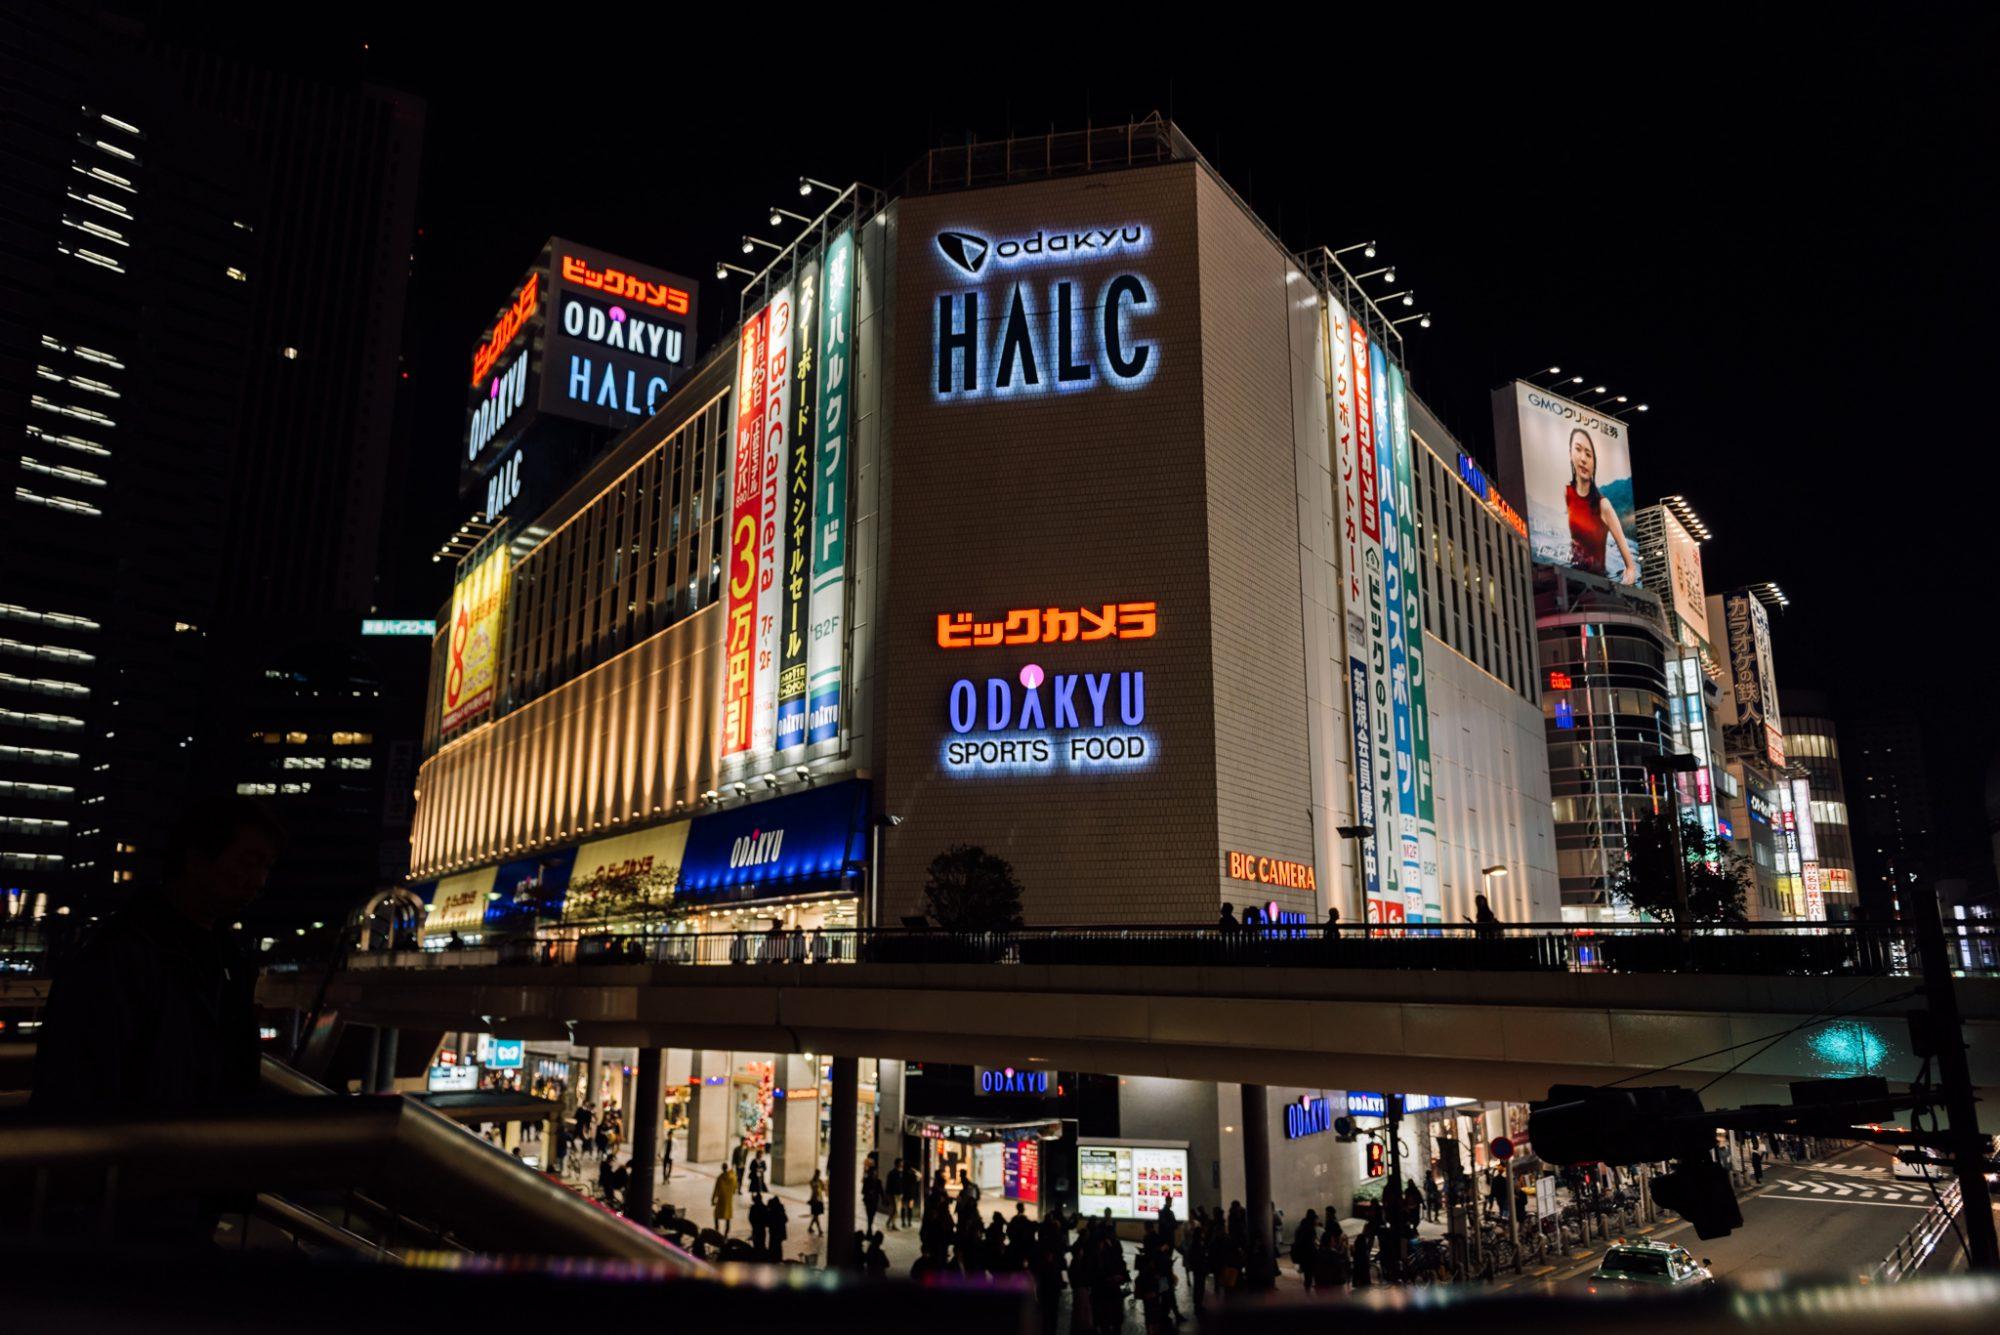 Wherever the trains take me, JAPAN